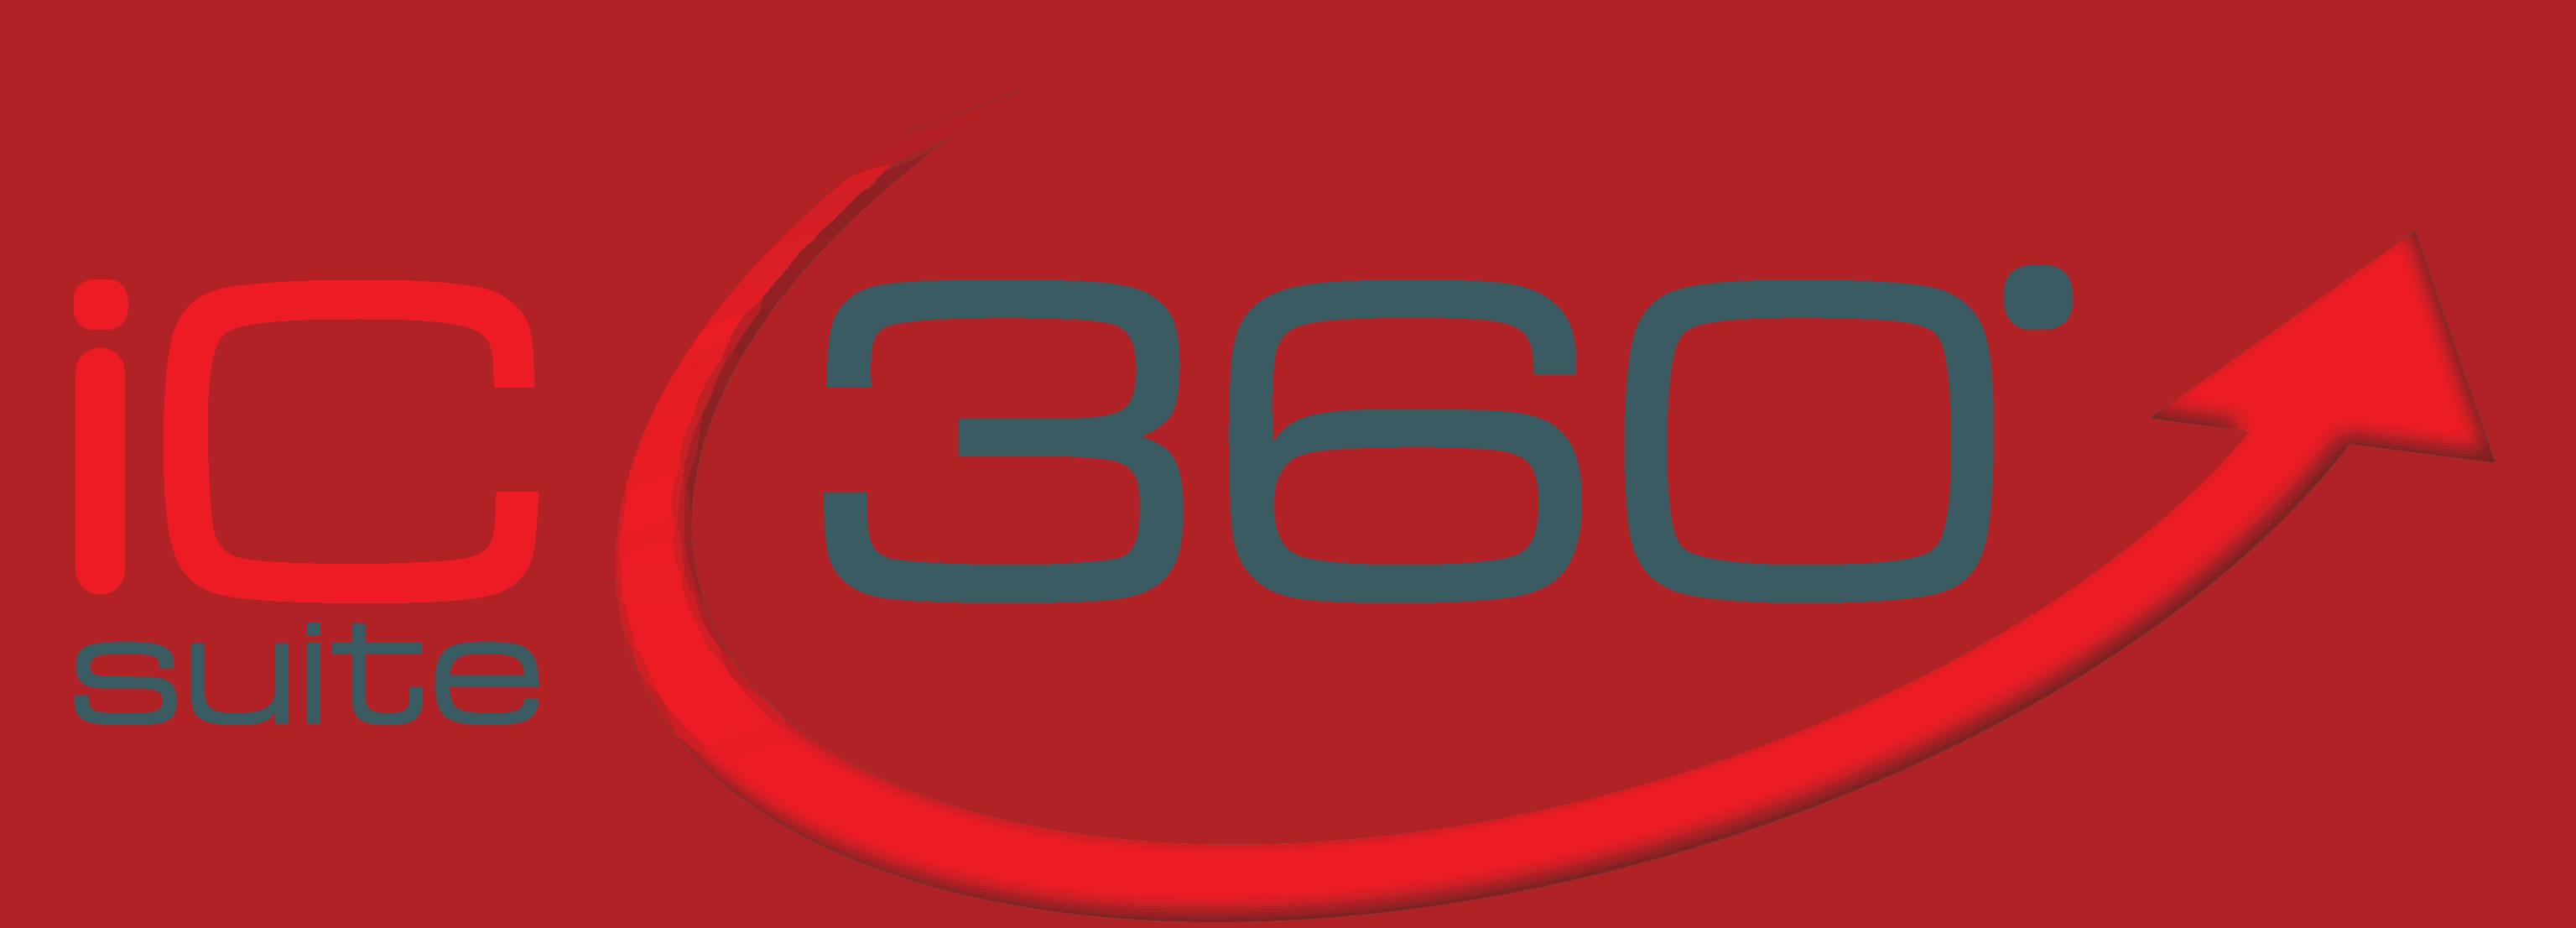 iC360